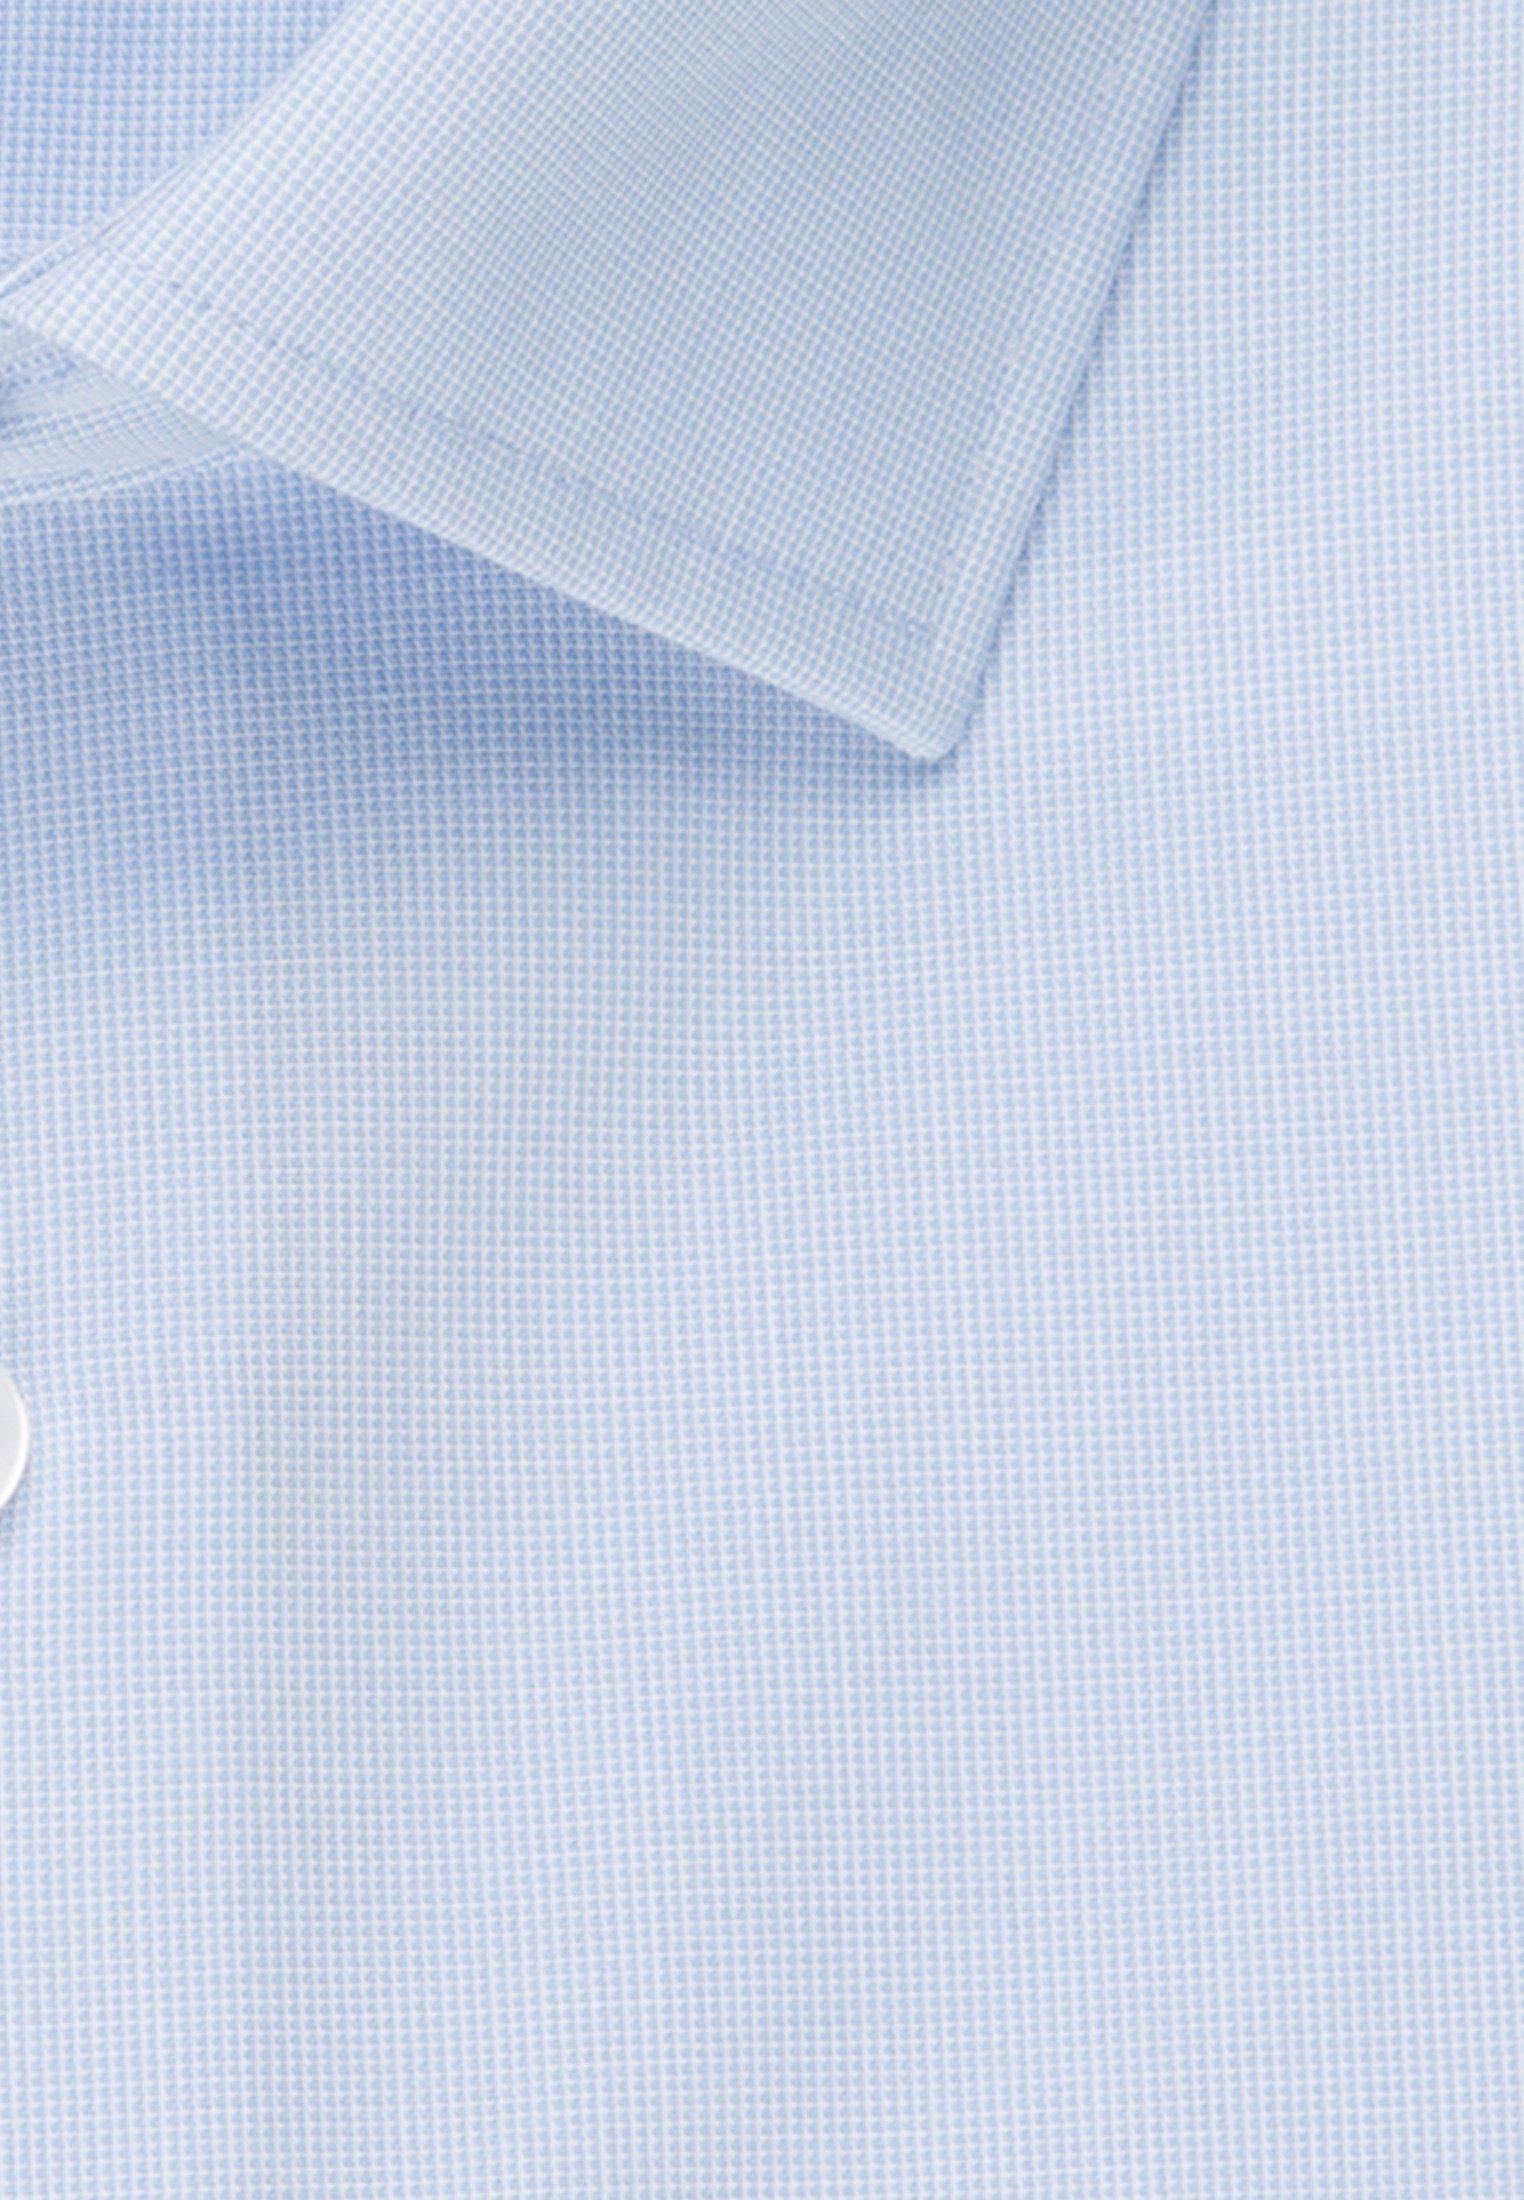 seidensticker Businesshemd Shaped Shaped Langarm Kentkragen Uni online kaufen ZvDSPi